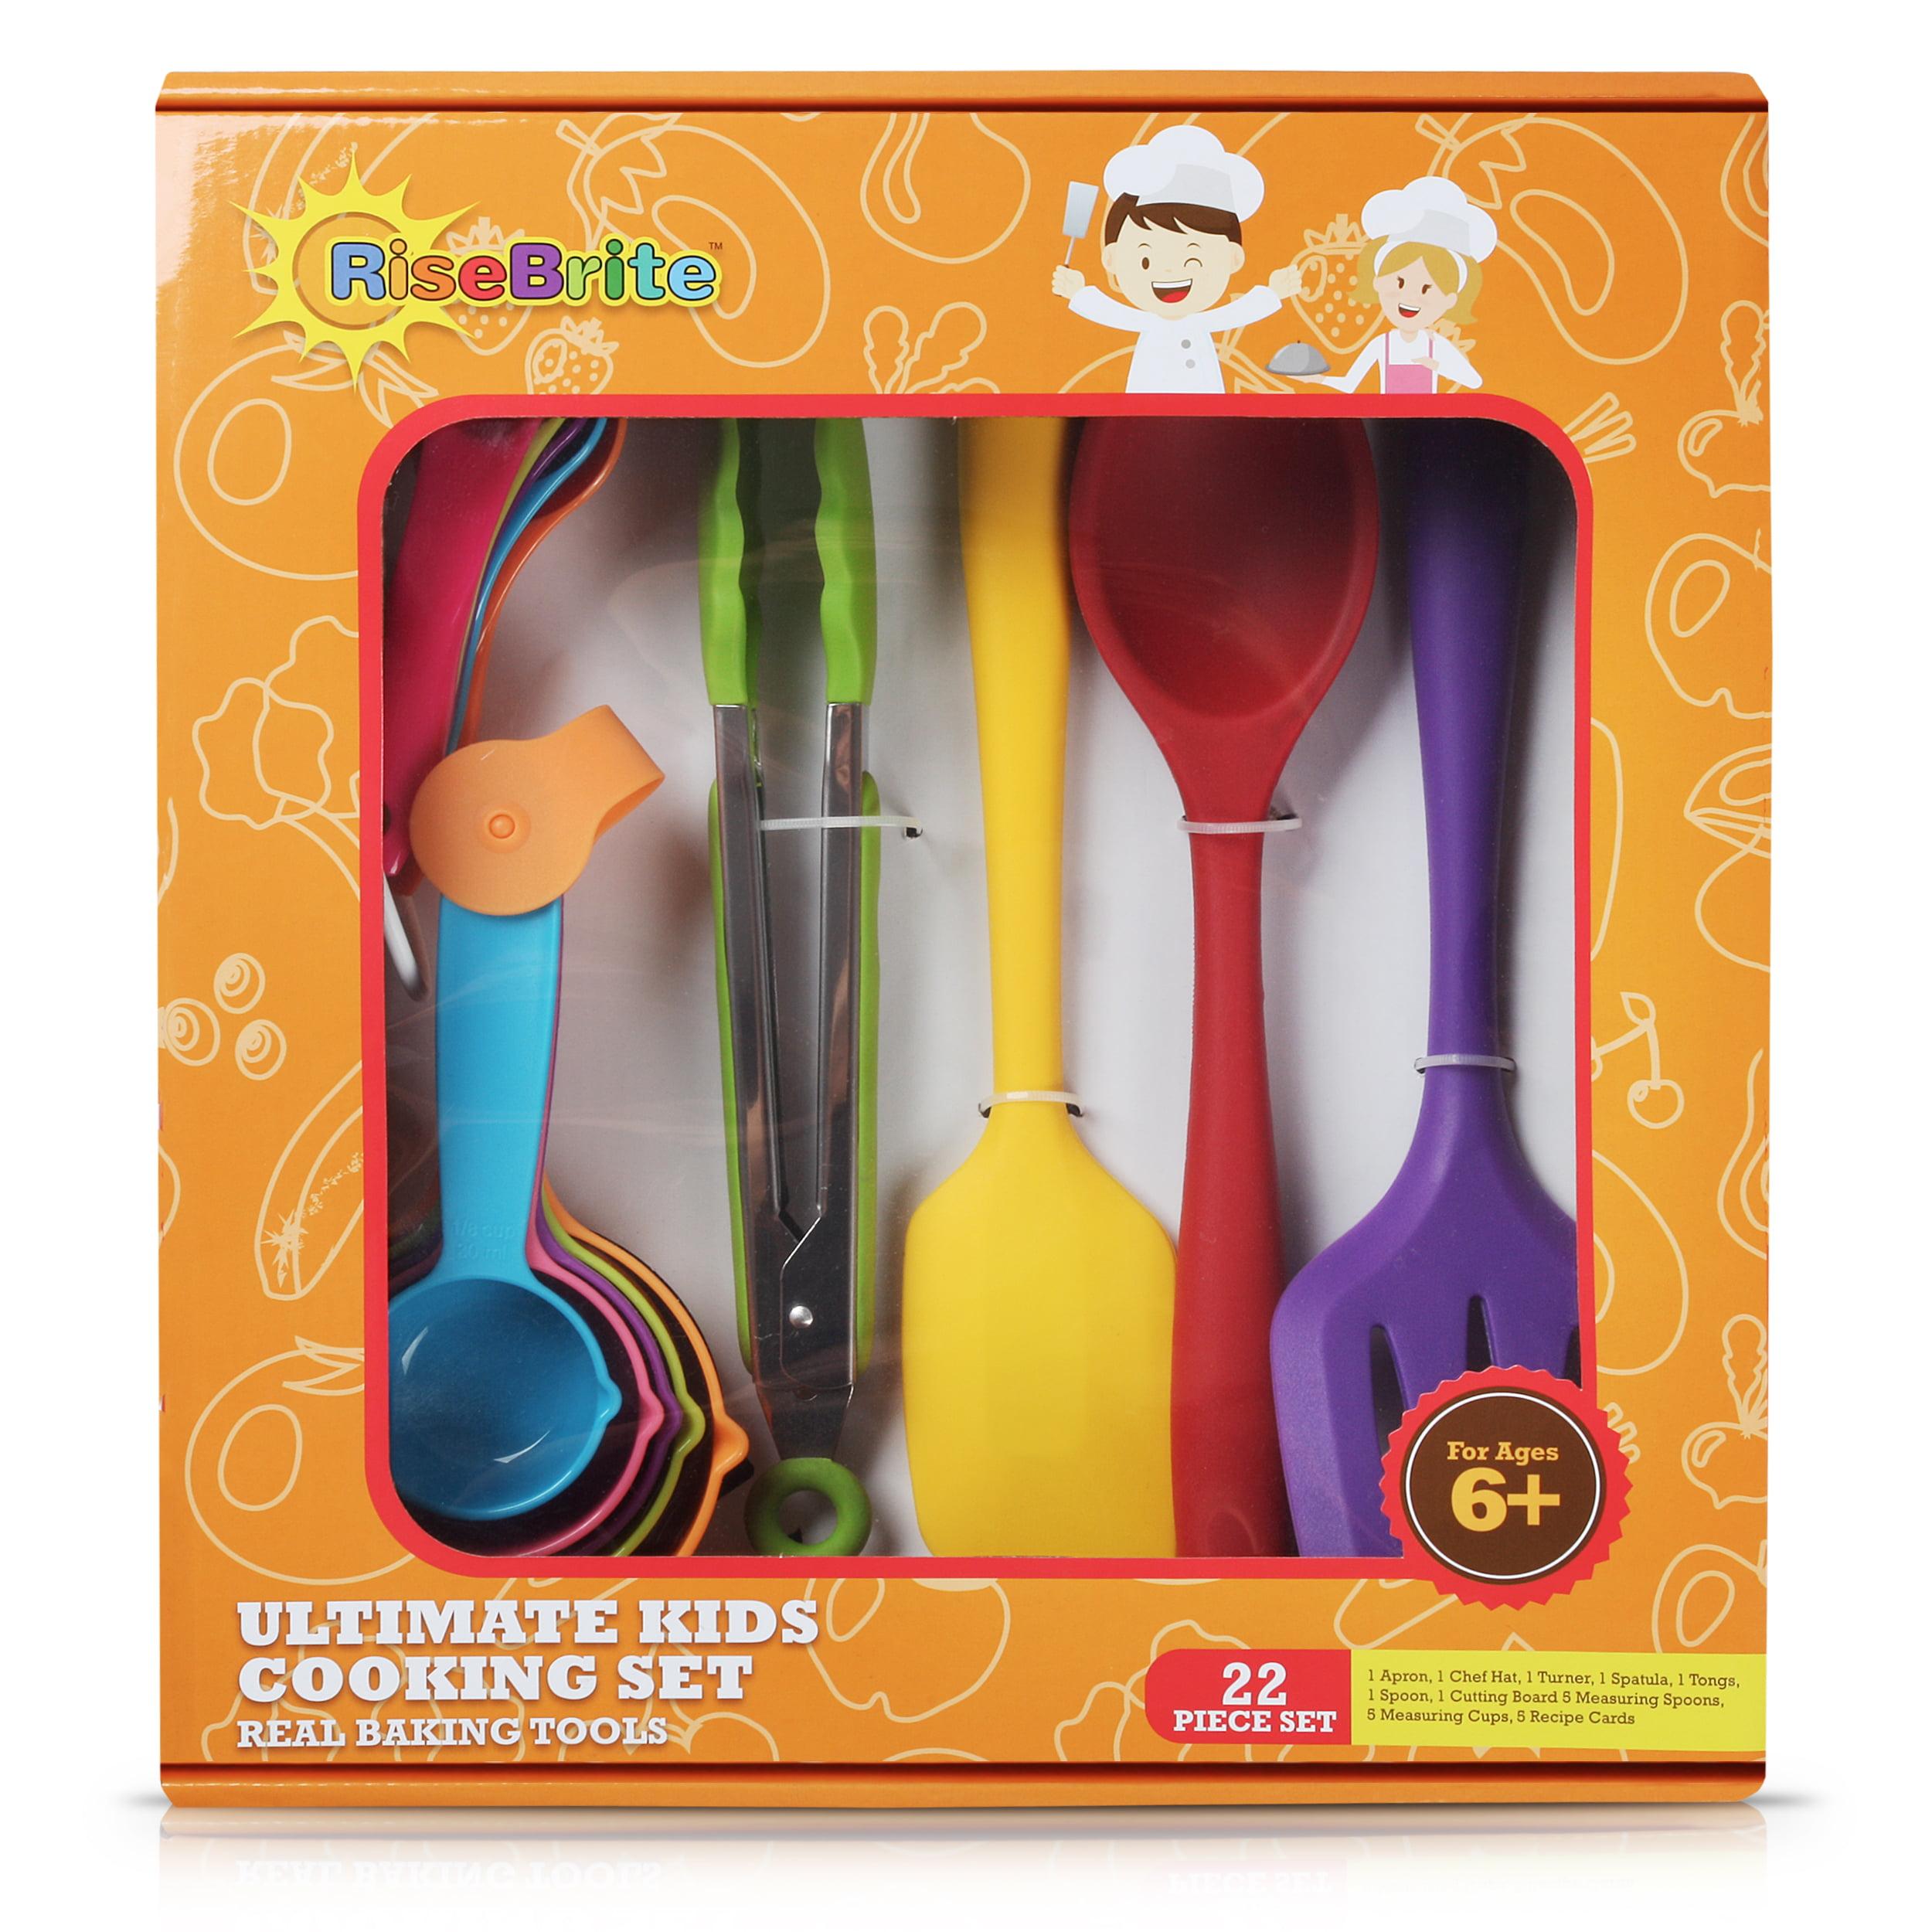 personalized engraved cutting board /& spatula kid baking set kid cooking gift set child baking gift Kid/'s cutting board and spatula set